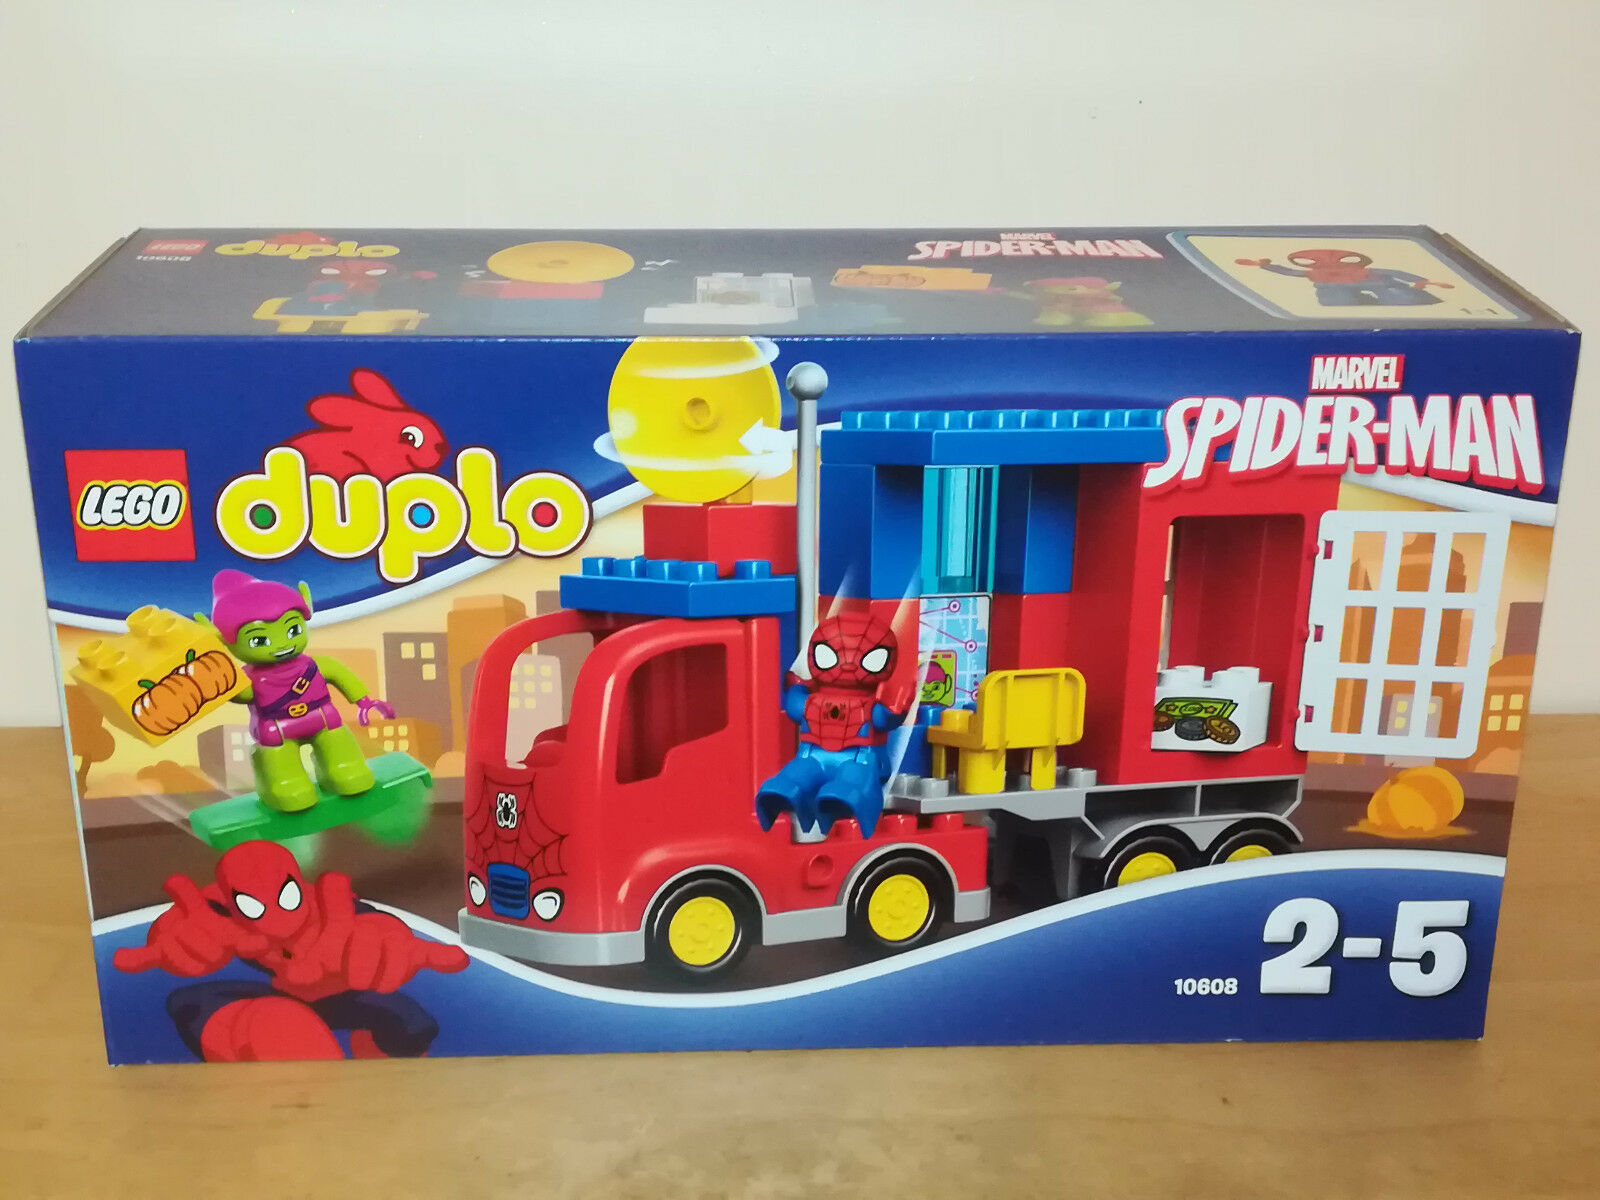 LEGO DUPLO 10608 SPIDER-MAN SPIDER CAMION avventura Nuovo_5 include verde Goblin